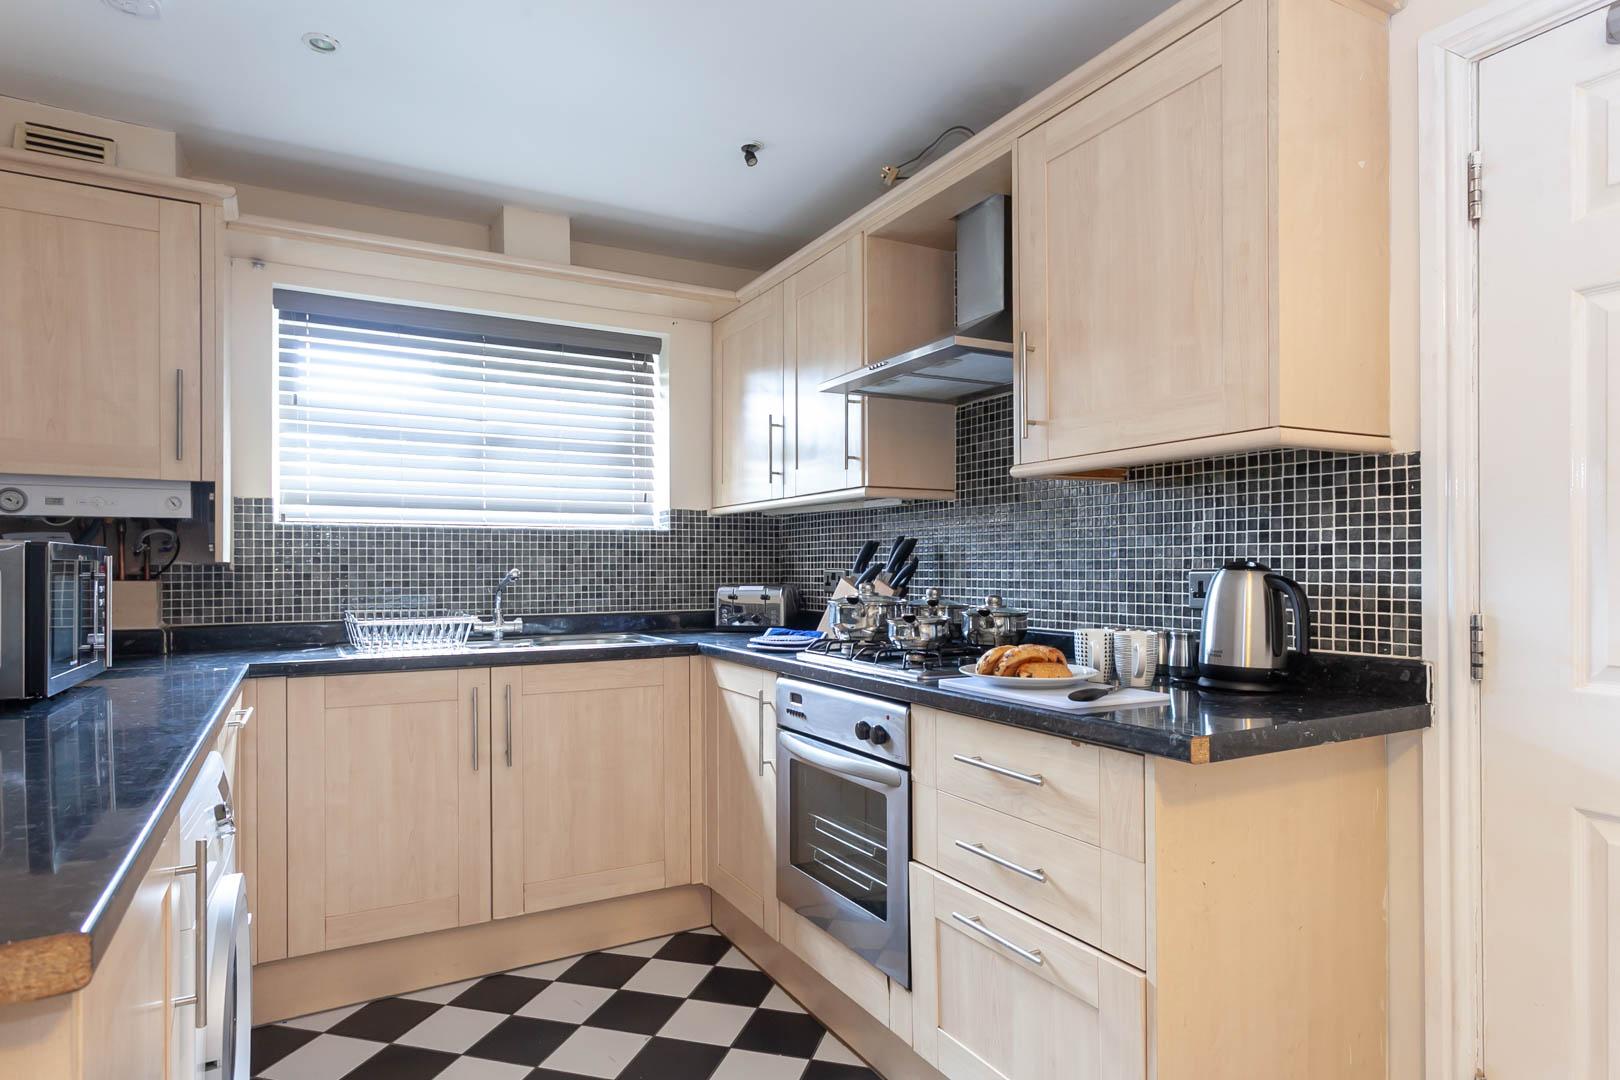 Kitchen at St Marys House, Latchford, Warrington